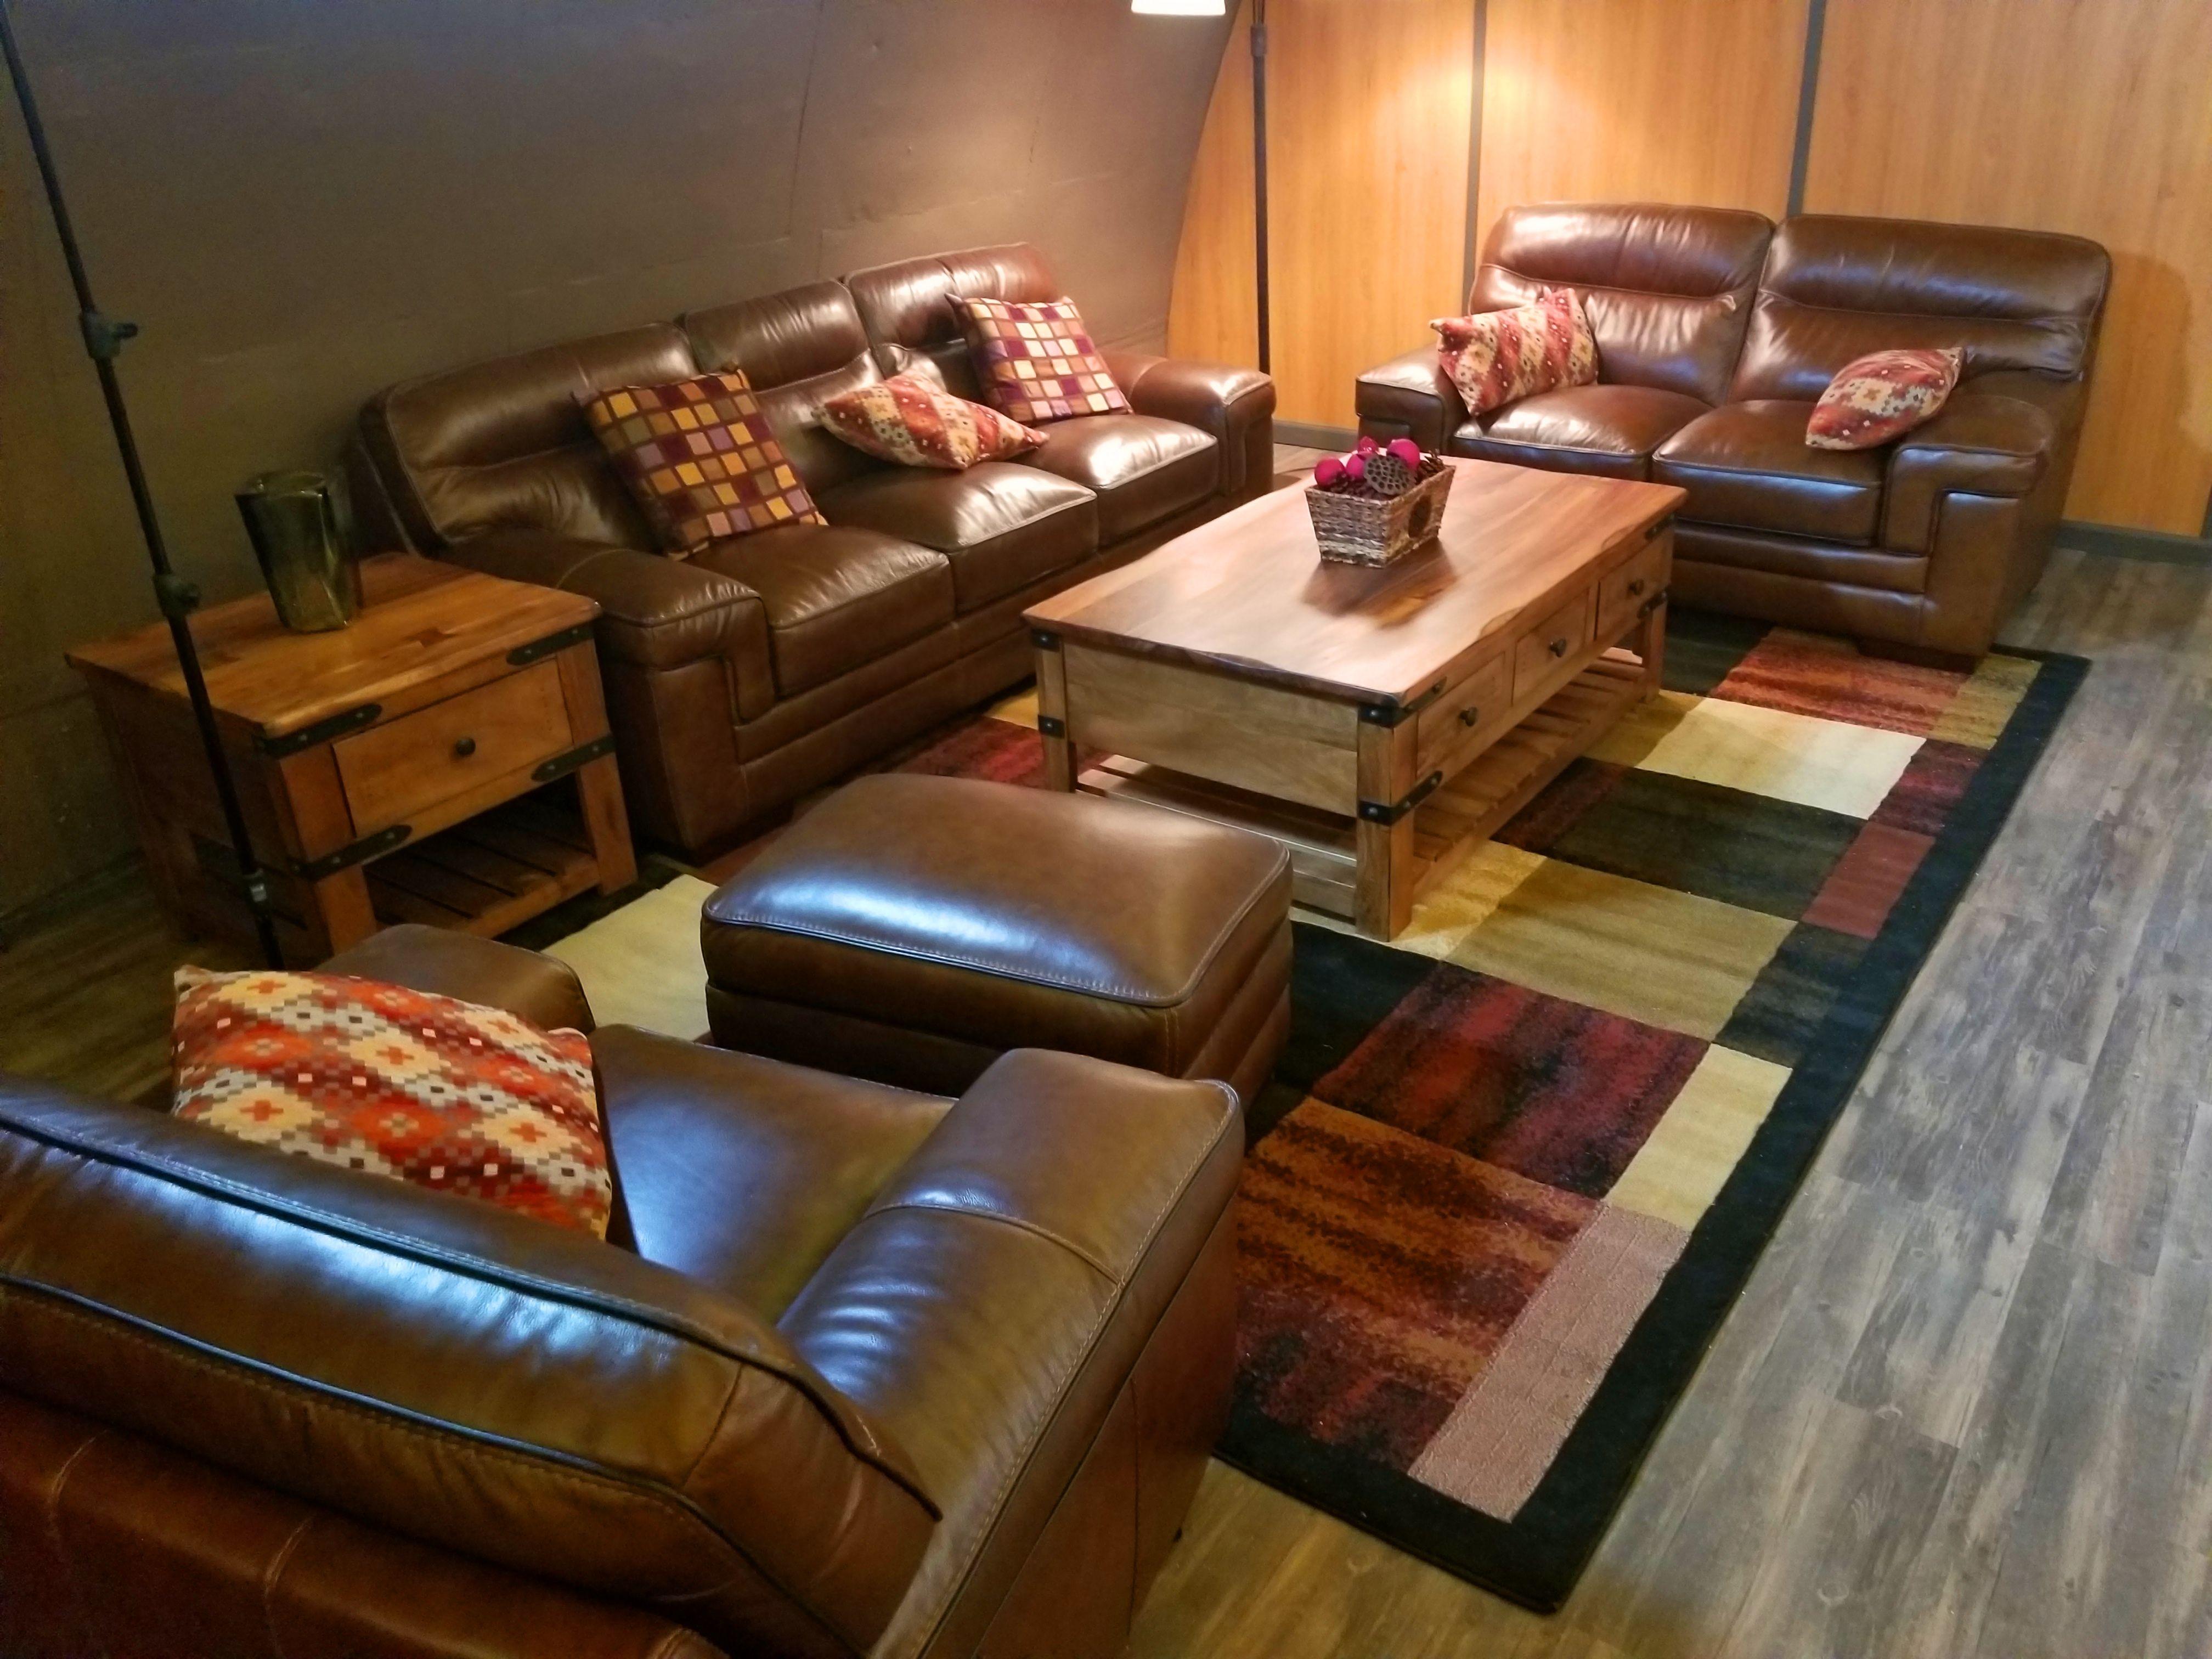 Plush luxury salon within a vivos xpoint bunker in south dakota